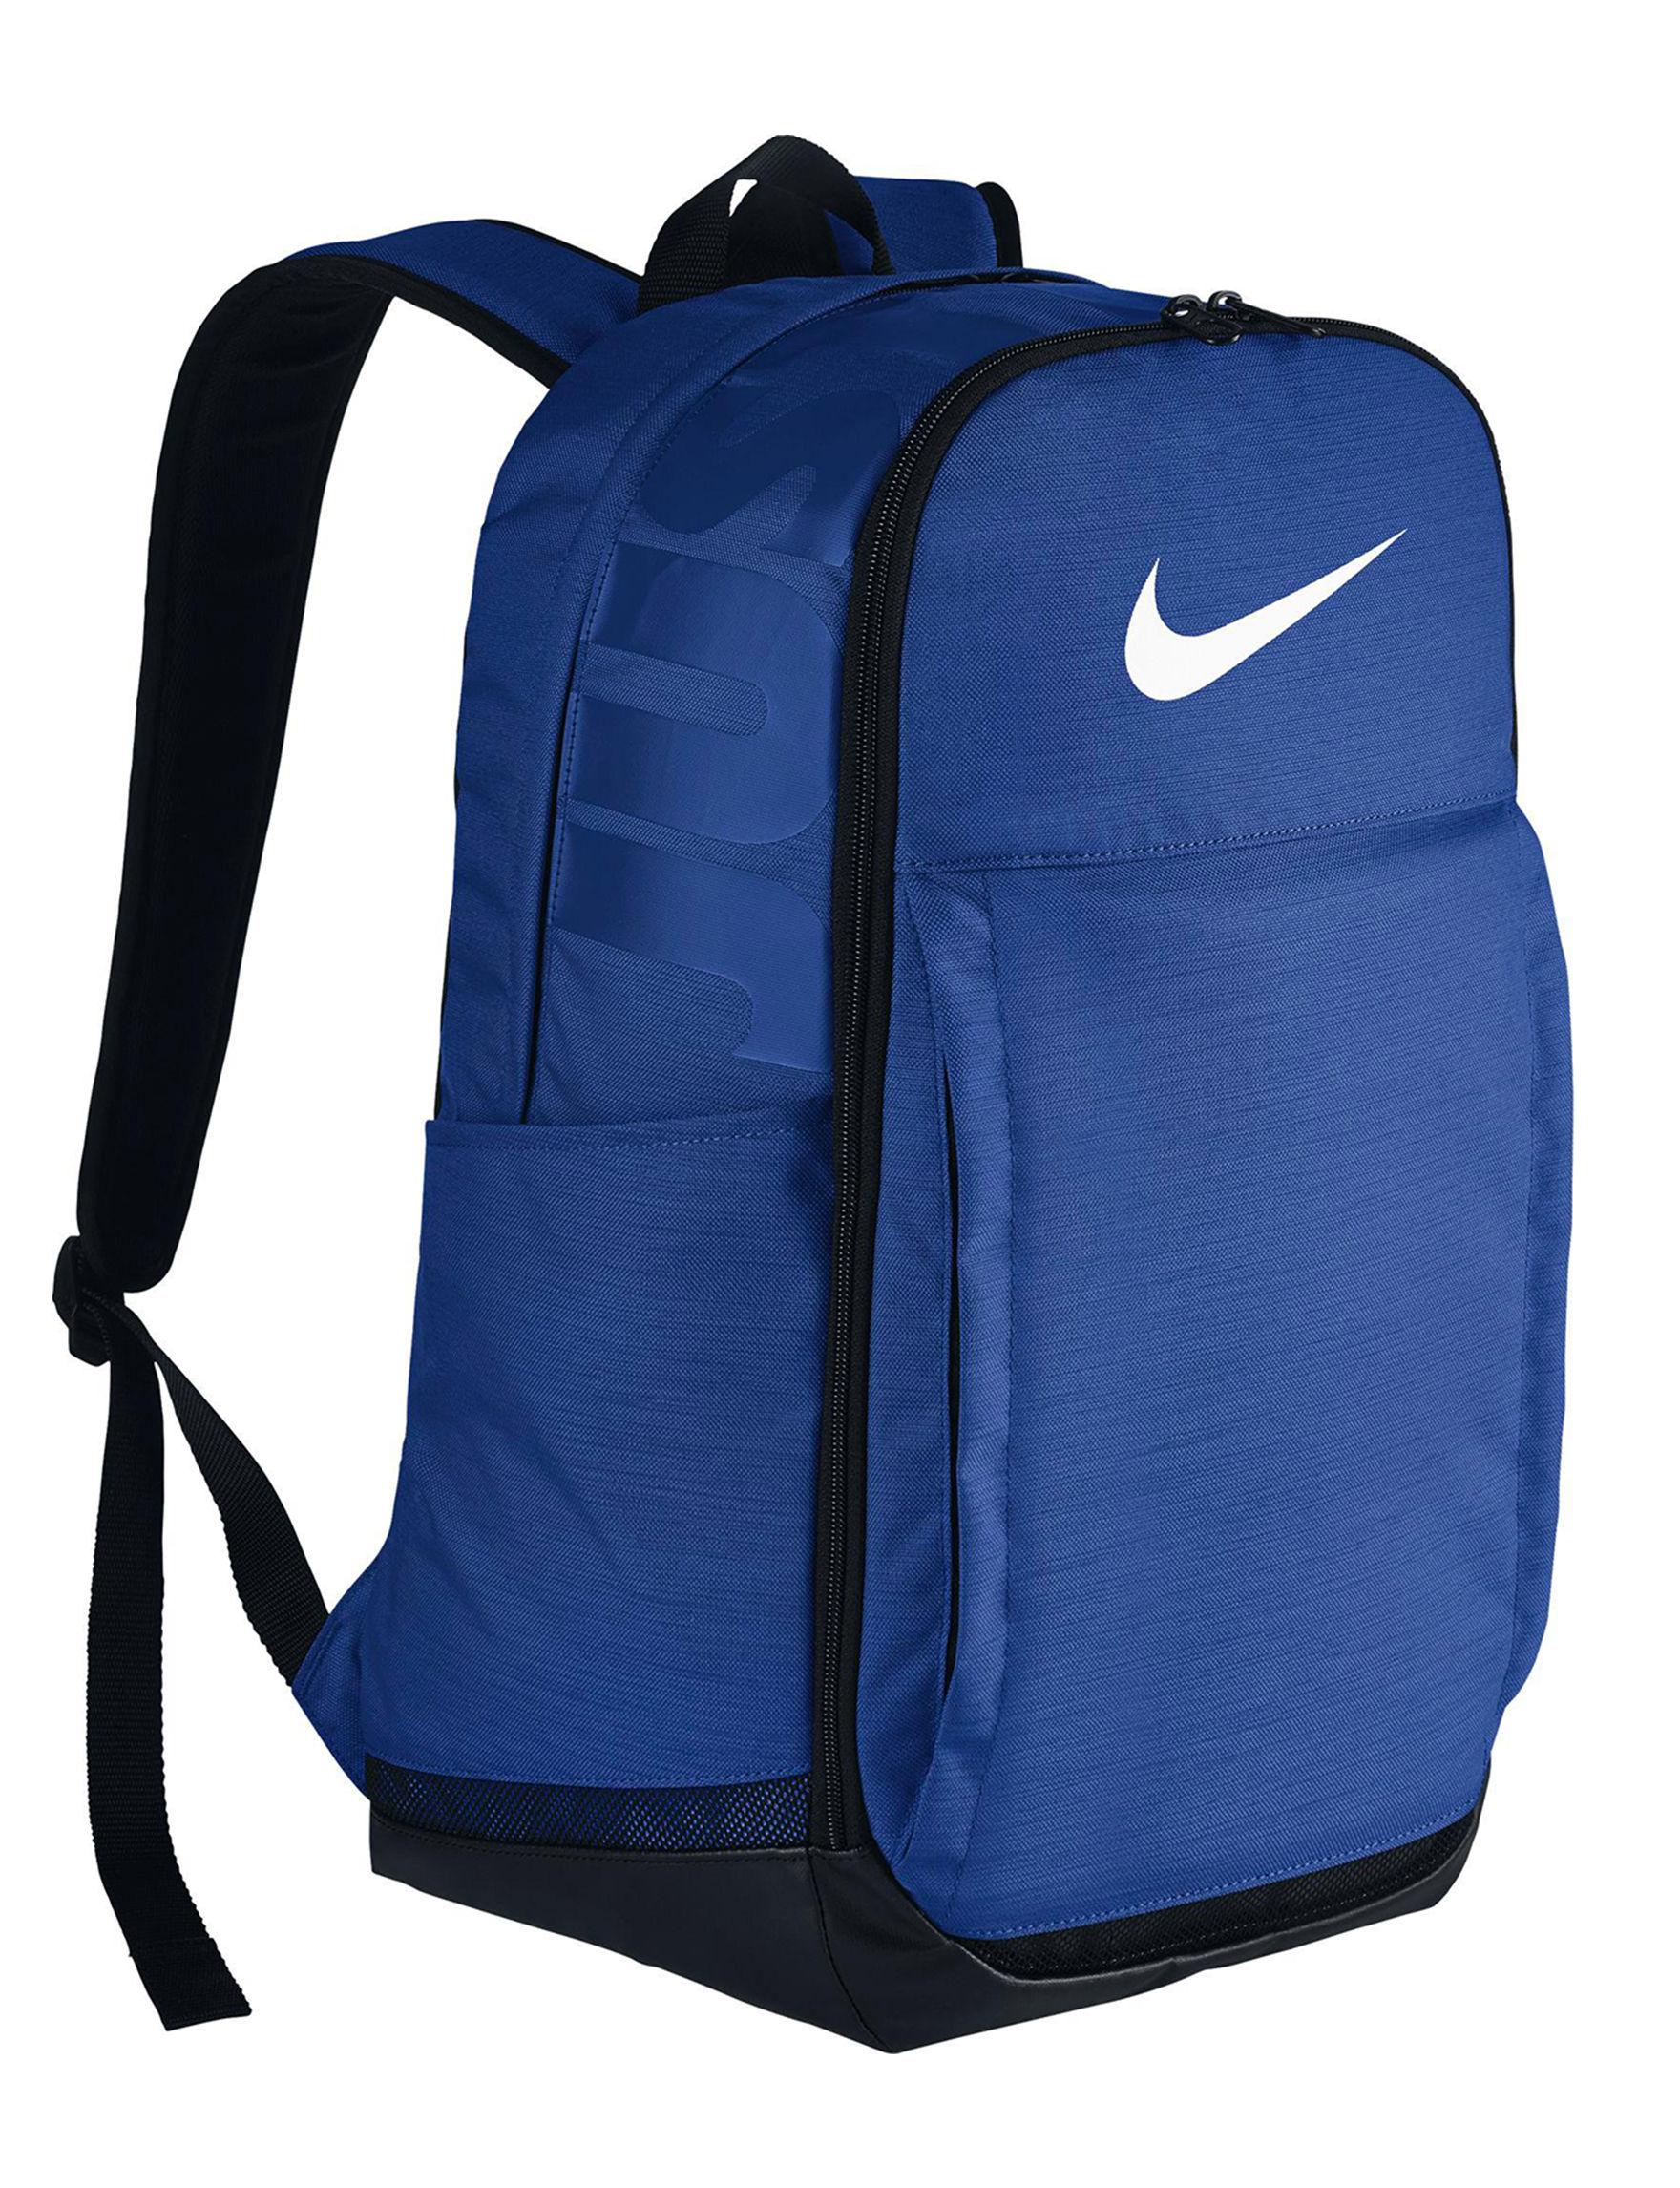 Nike Blue / White Bookbags & Backpacks